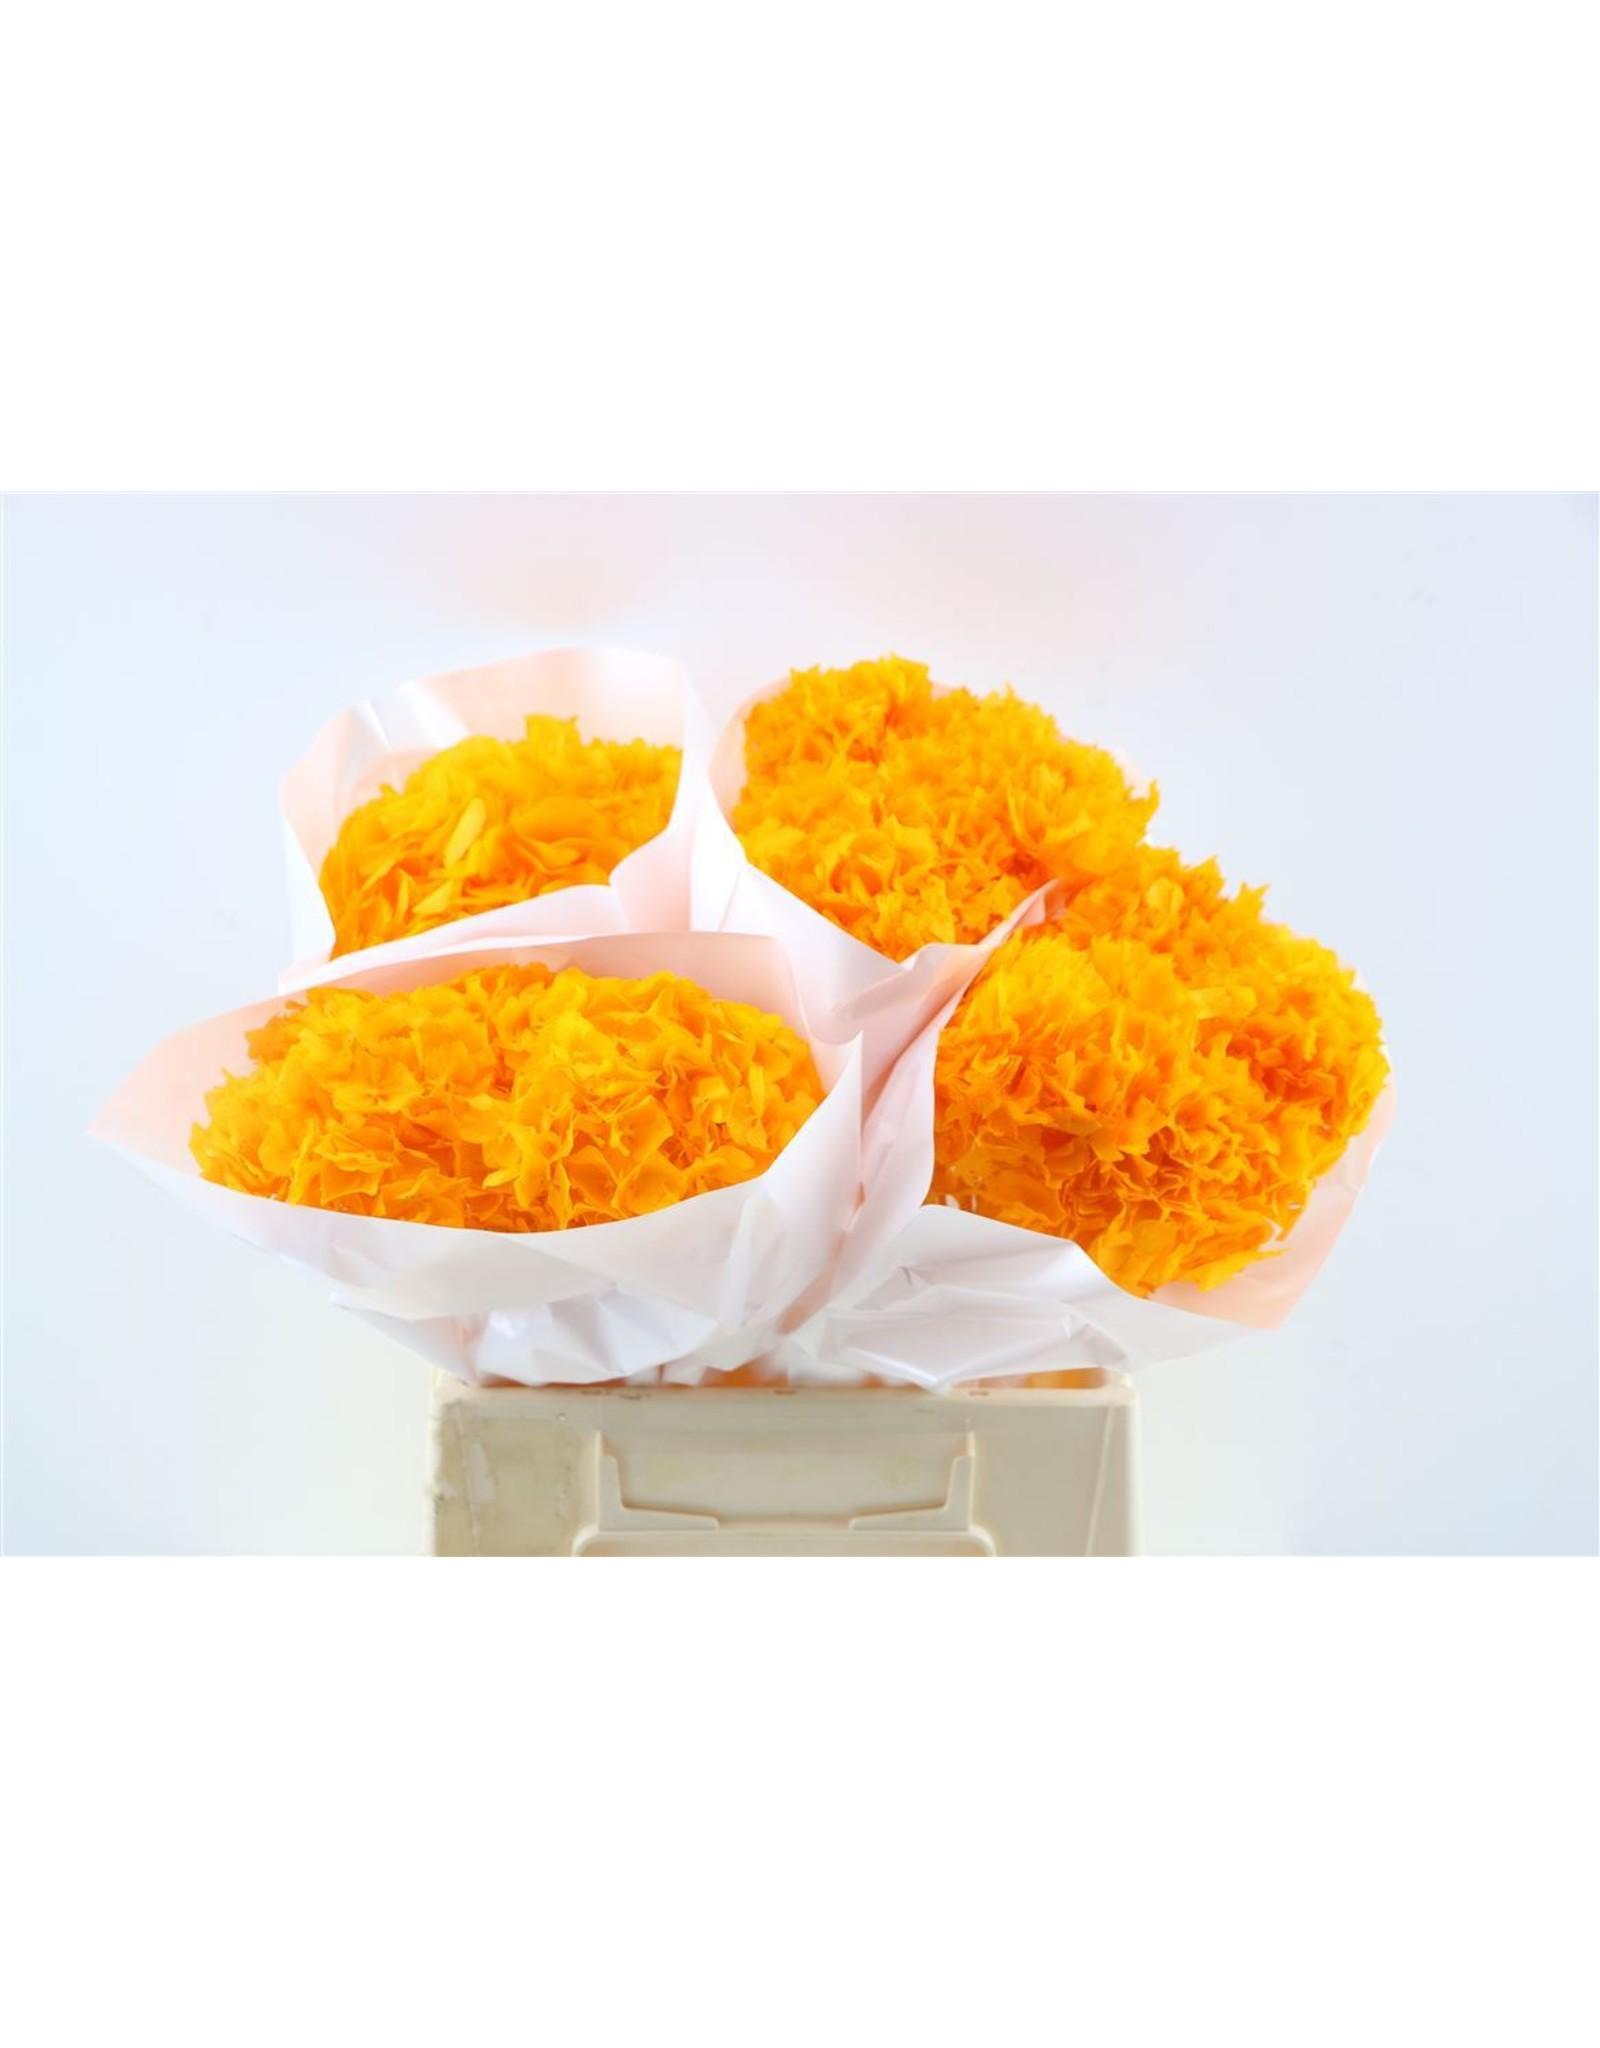 Dried Hydrangea Apricot Pro Bunch x 1